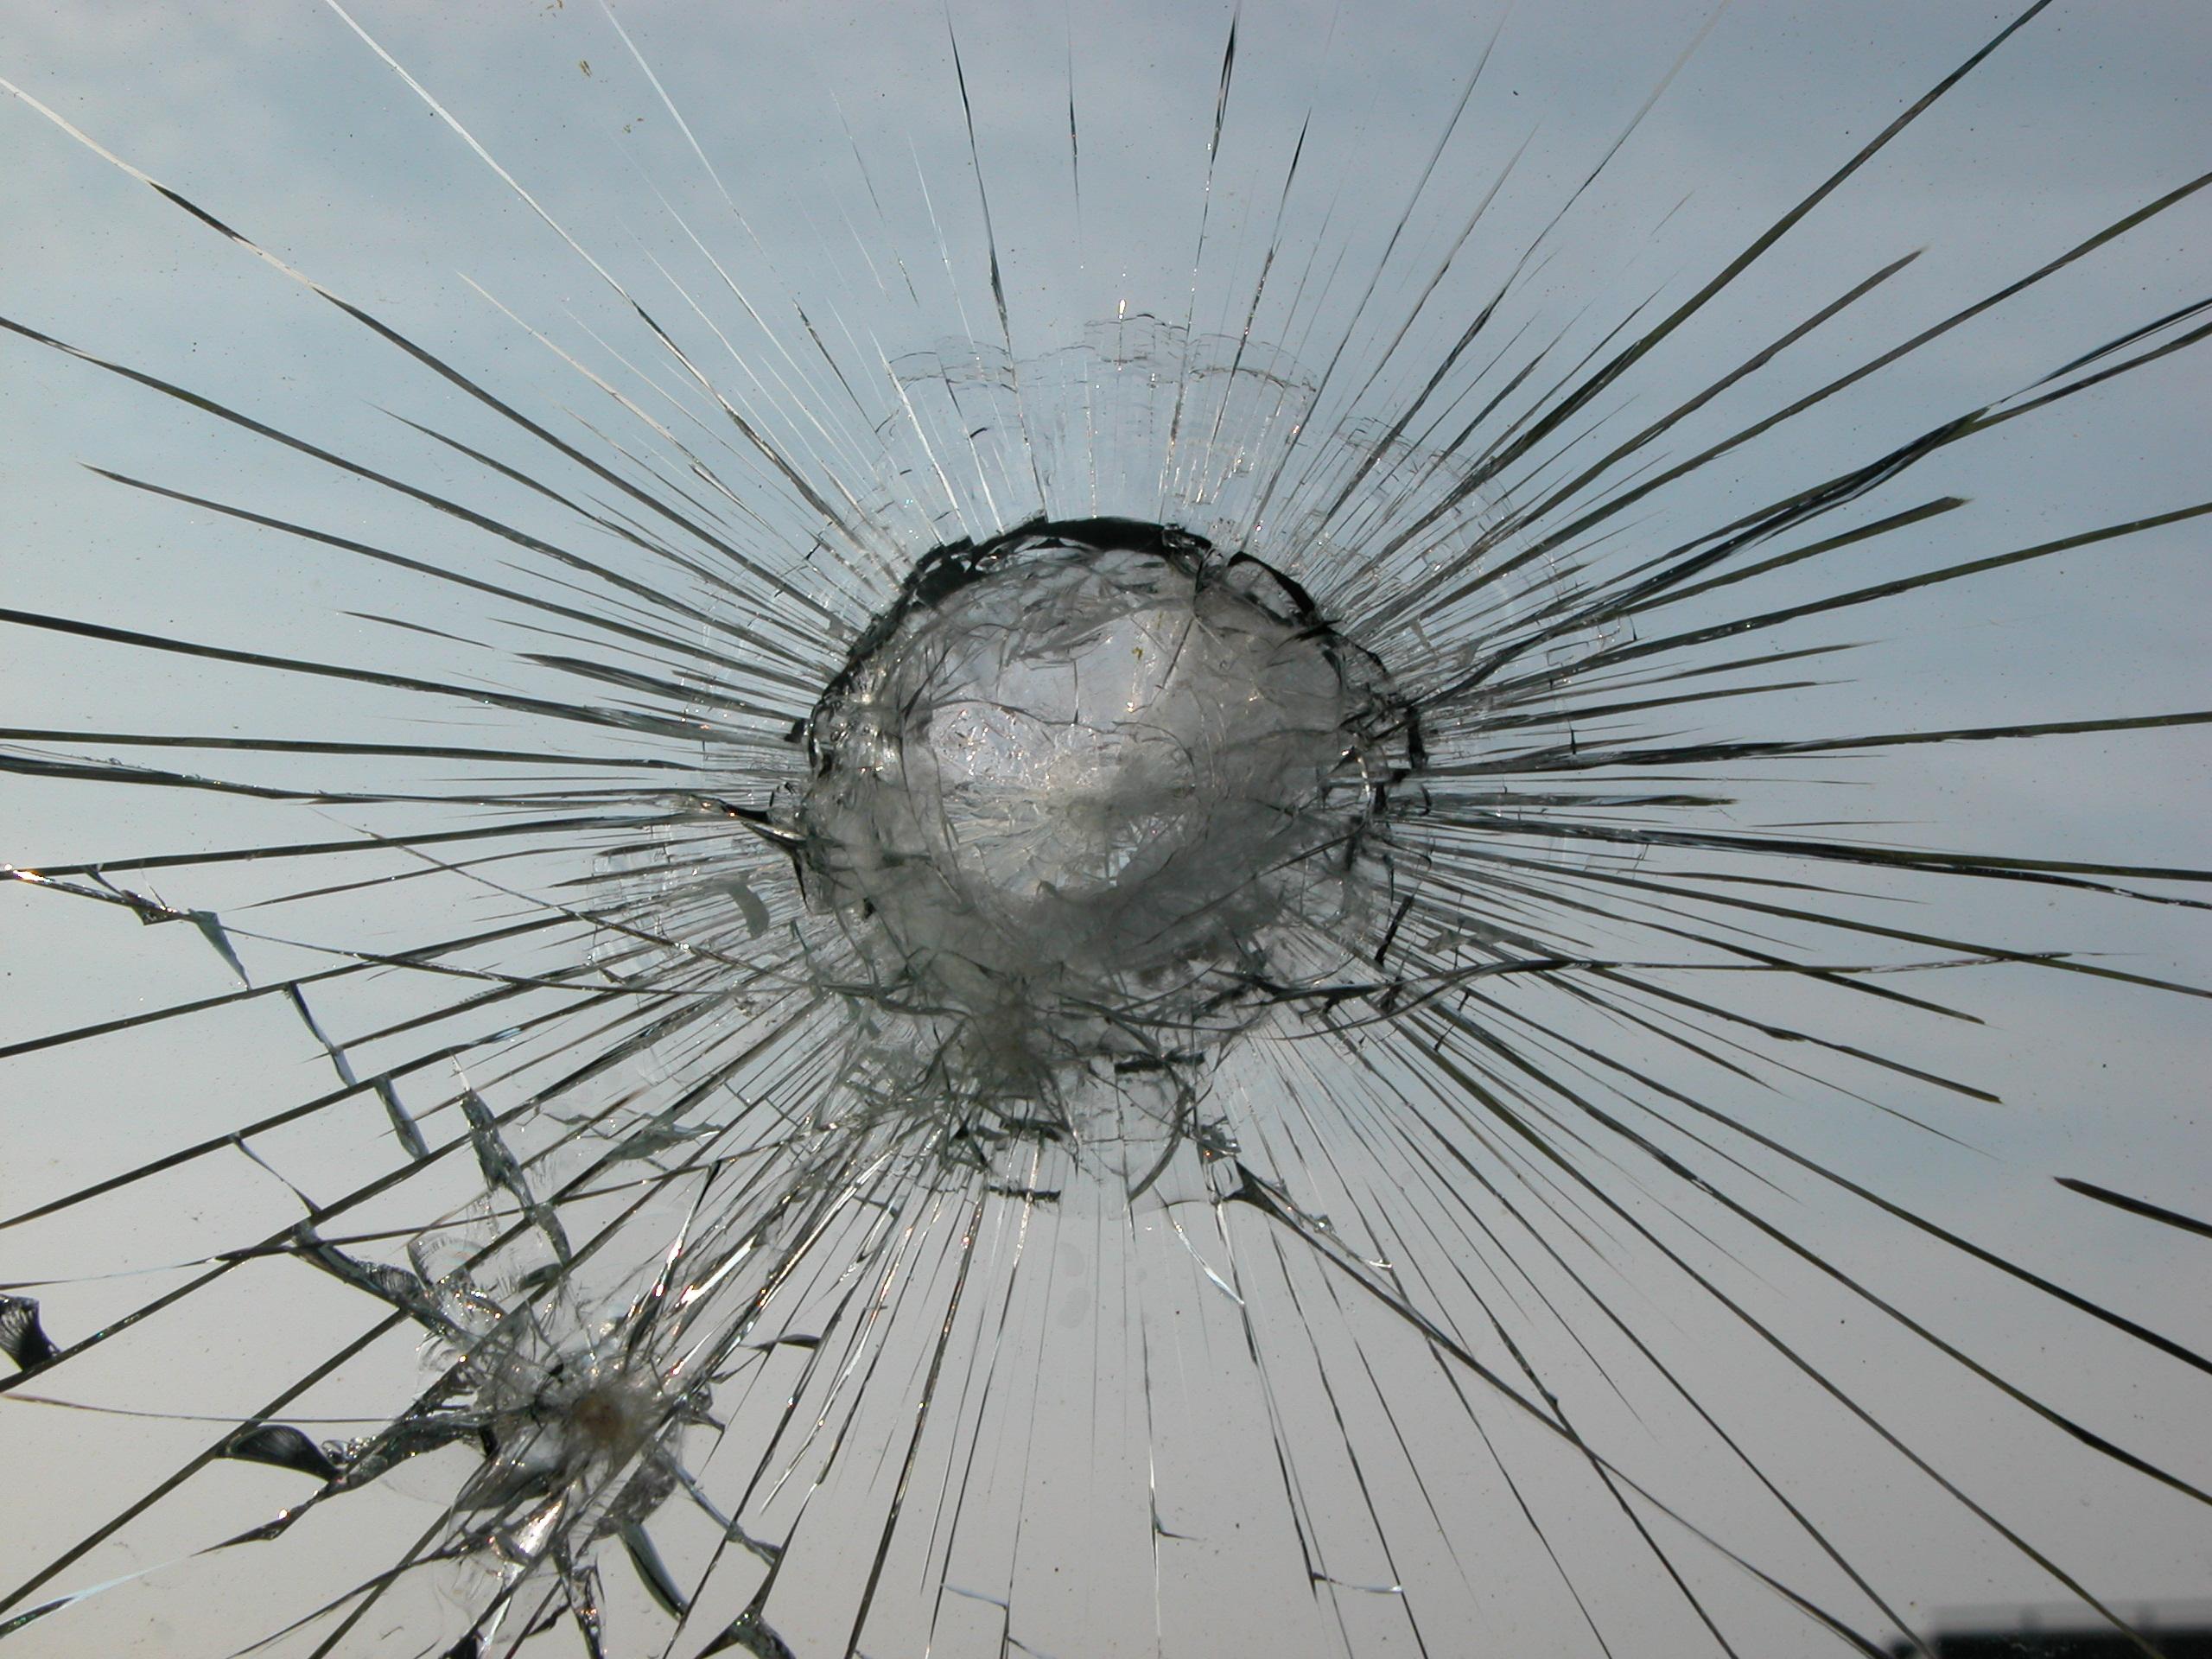 crack splintered glass window car windshield